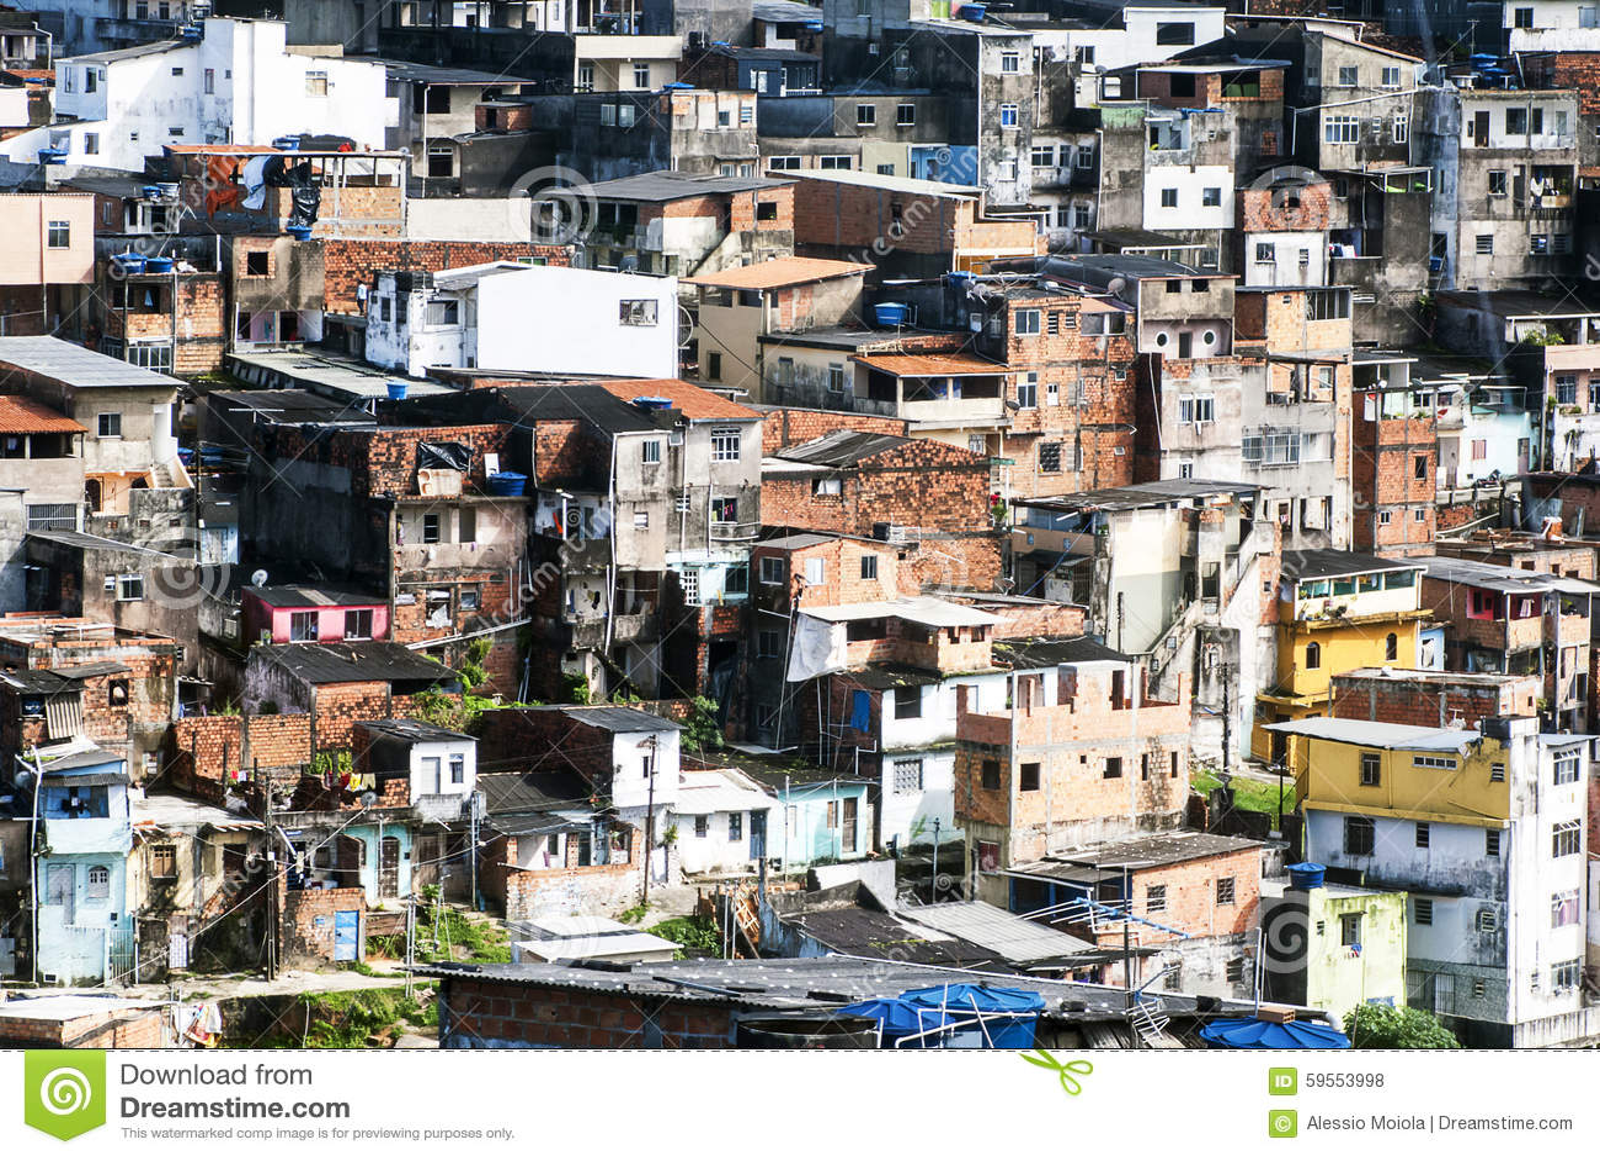 Salvador i Bahia, Brasilien